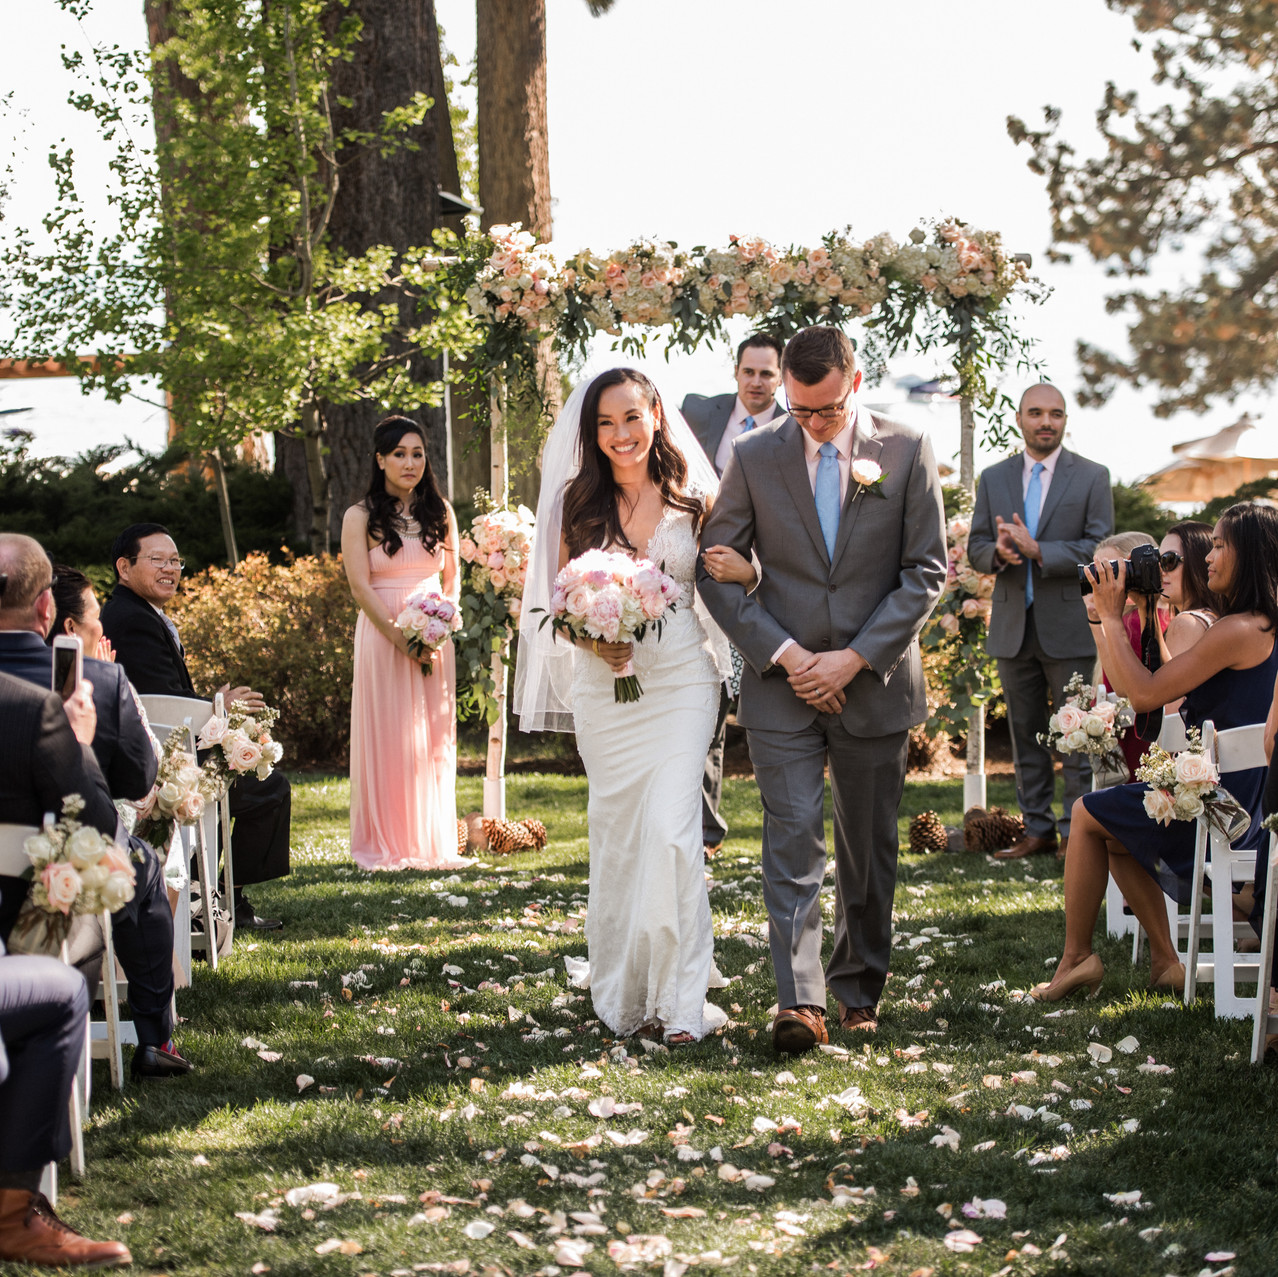 A-Floral-Affair-HYATT-LAKE-TAHOE-WEDDING-FLORIST (14)